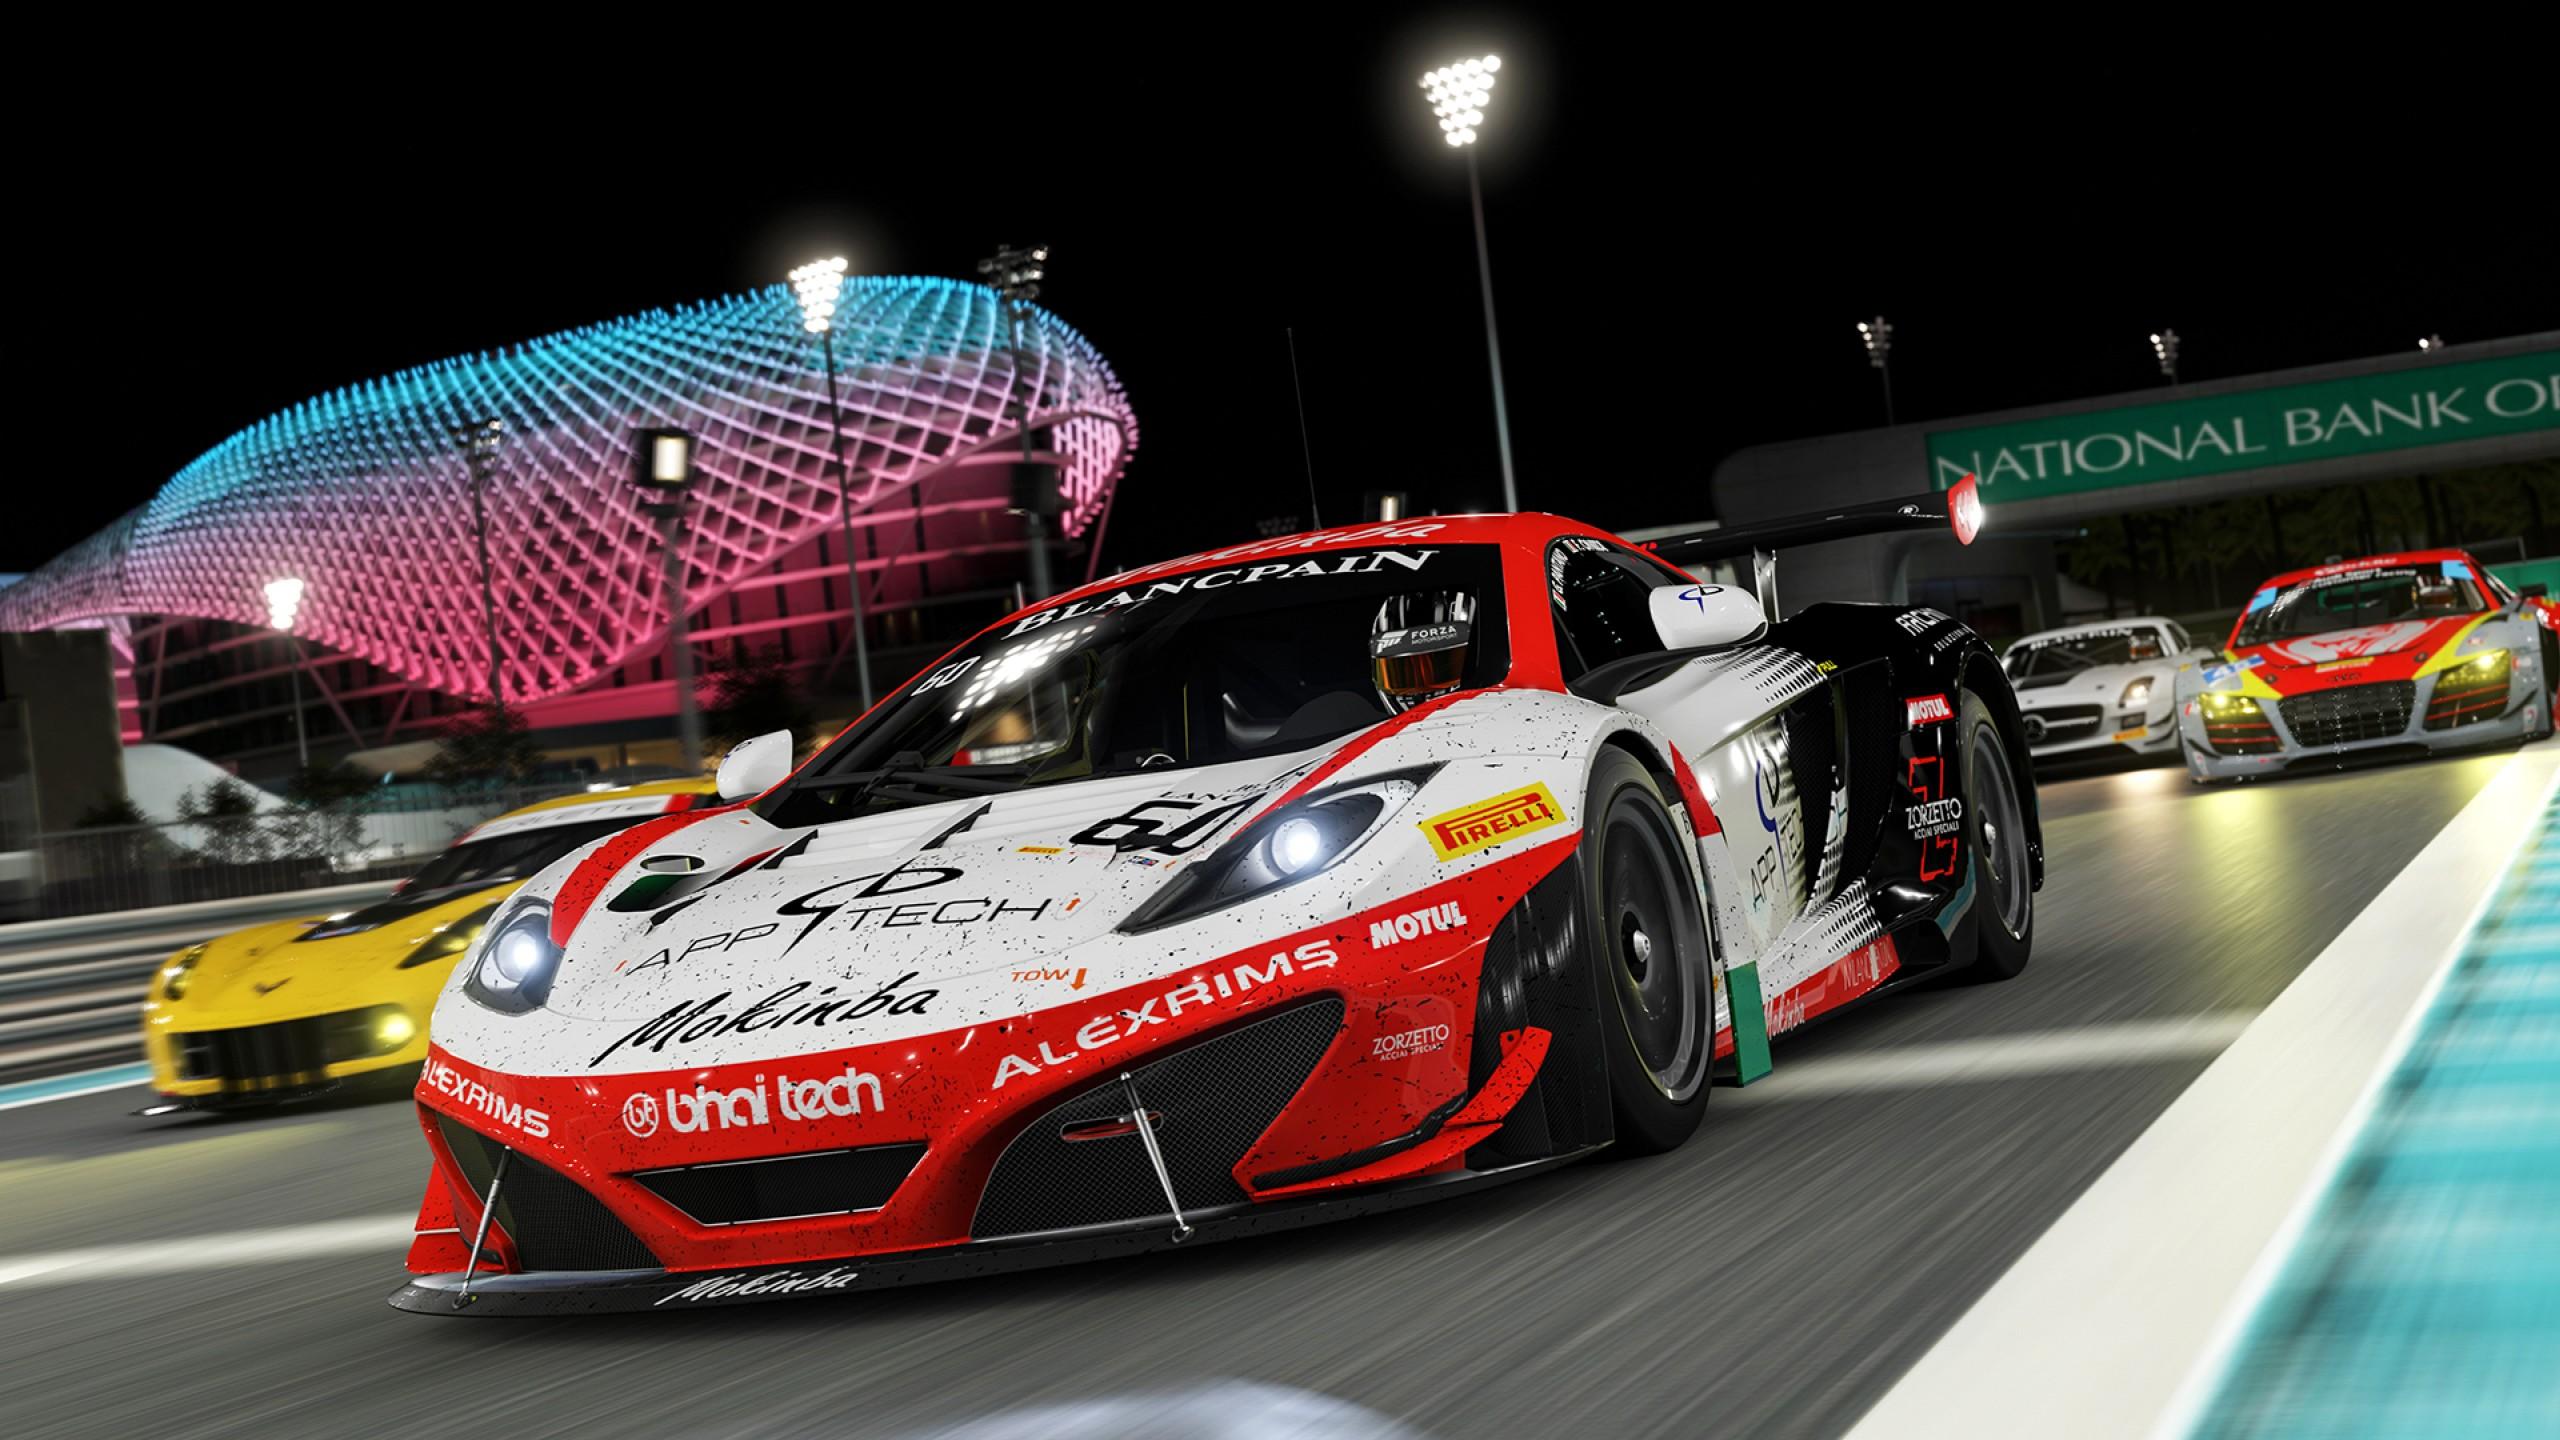 Forza Motorsport 6 Wallpaper 2560x1440